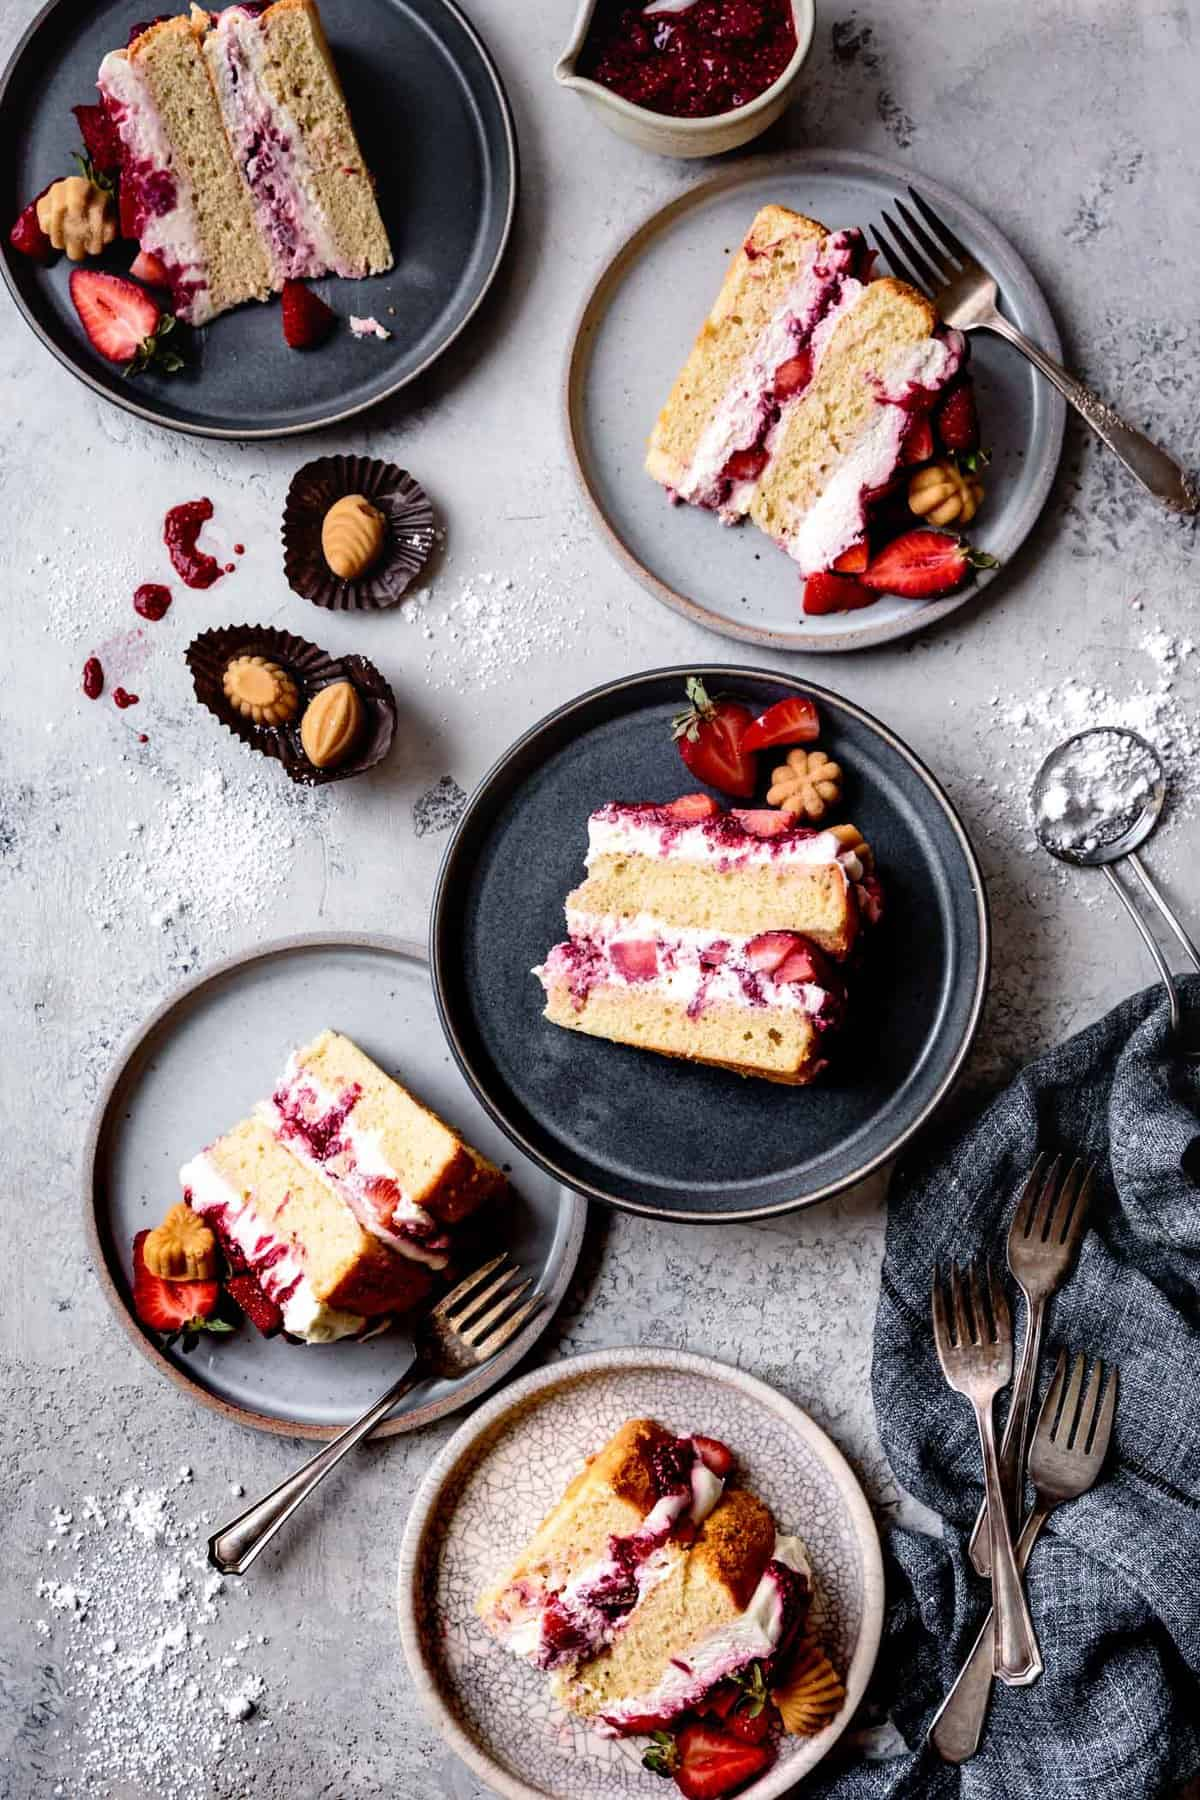 slices of gluten-free sponge cake on plates